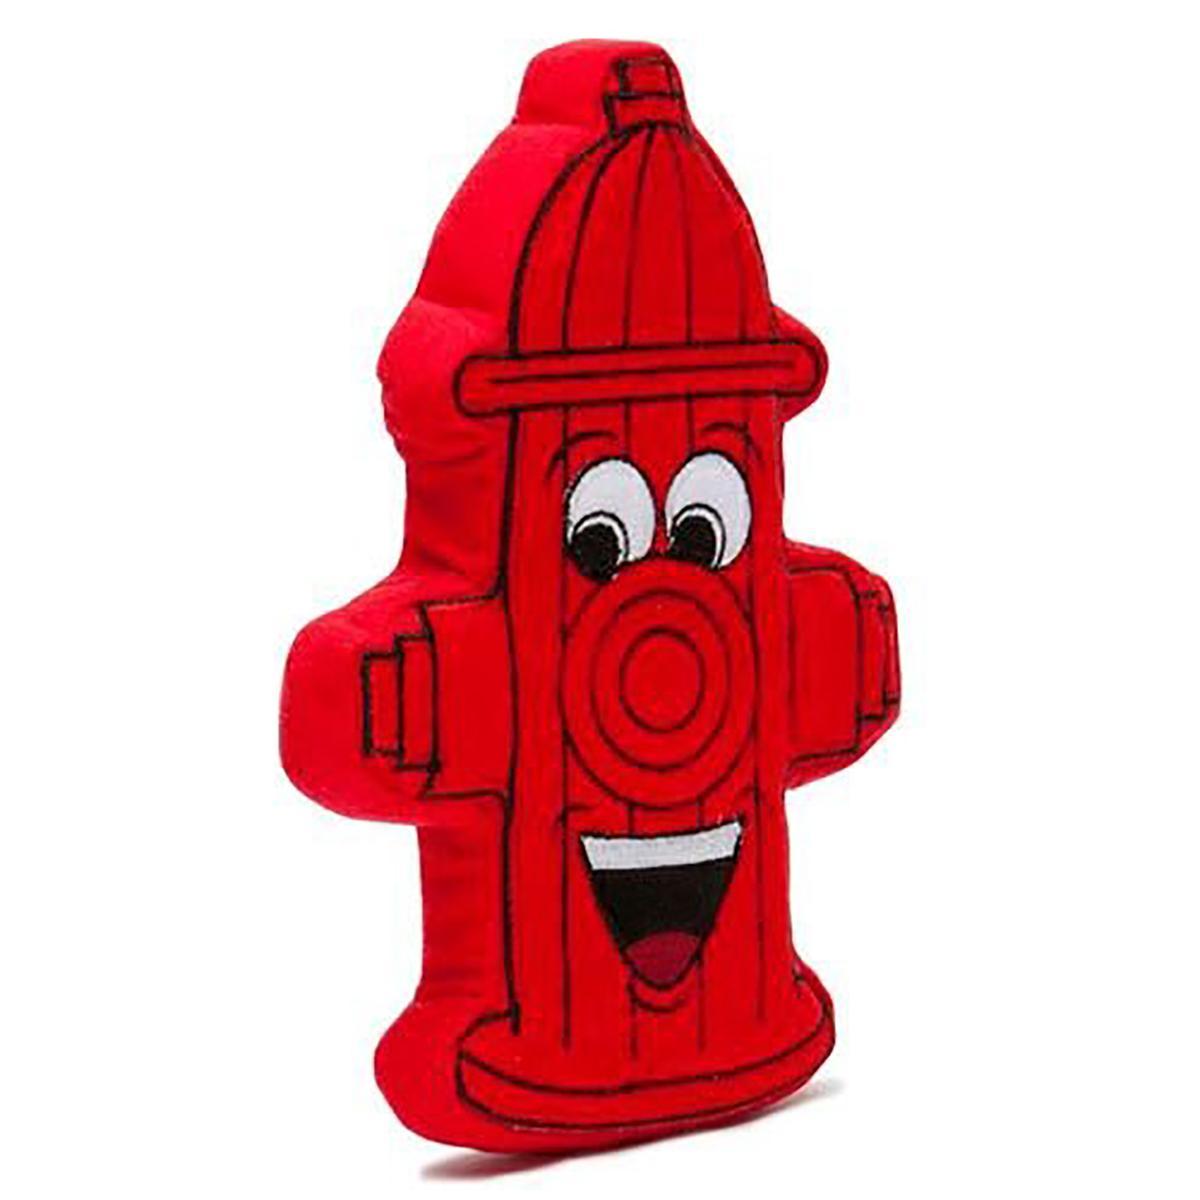 PrideBites Fire Hydrant Dog Toy